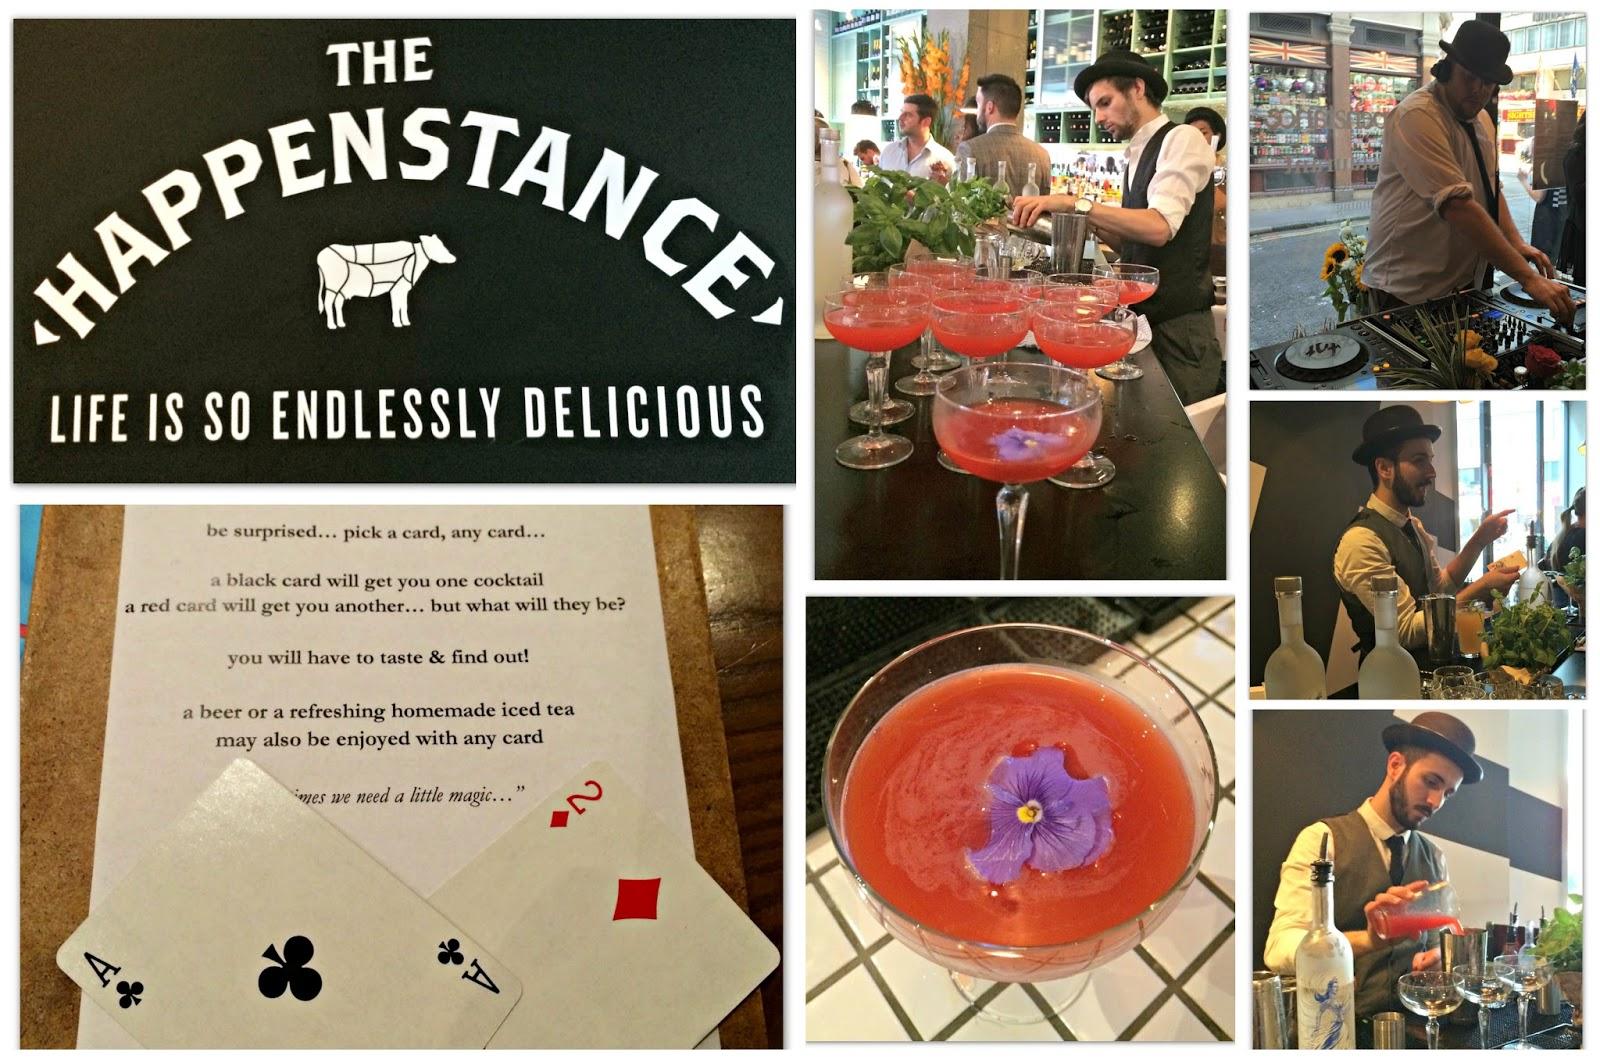 The Happenstance Restaurant